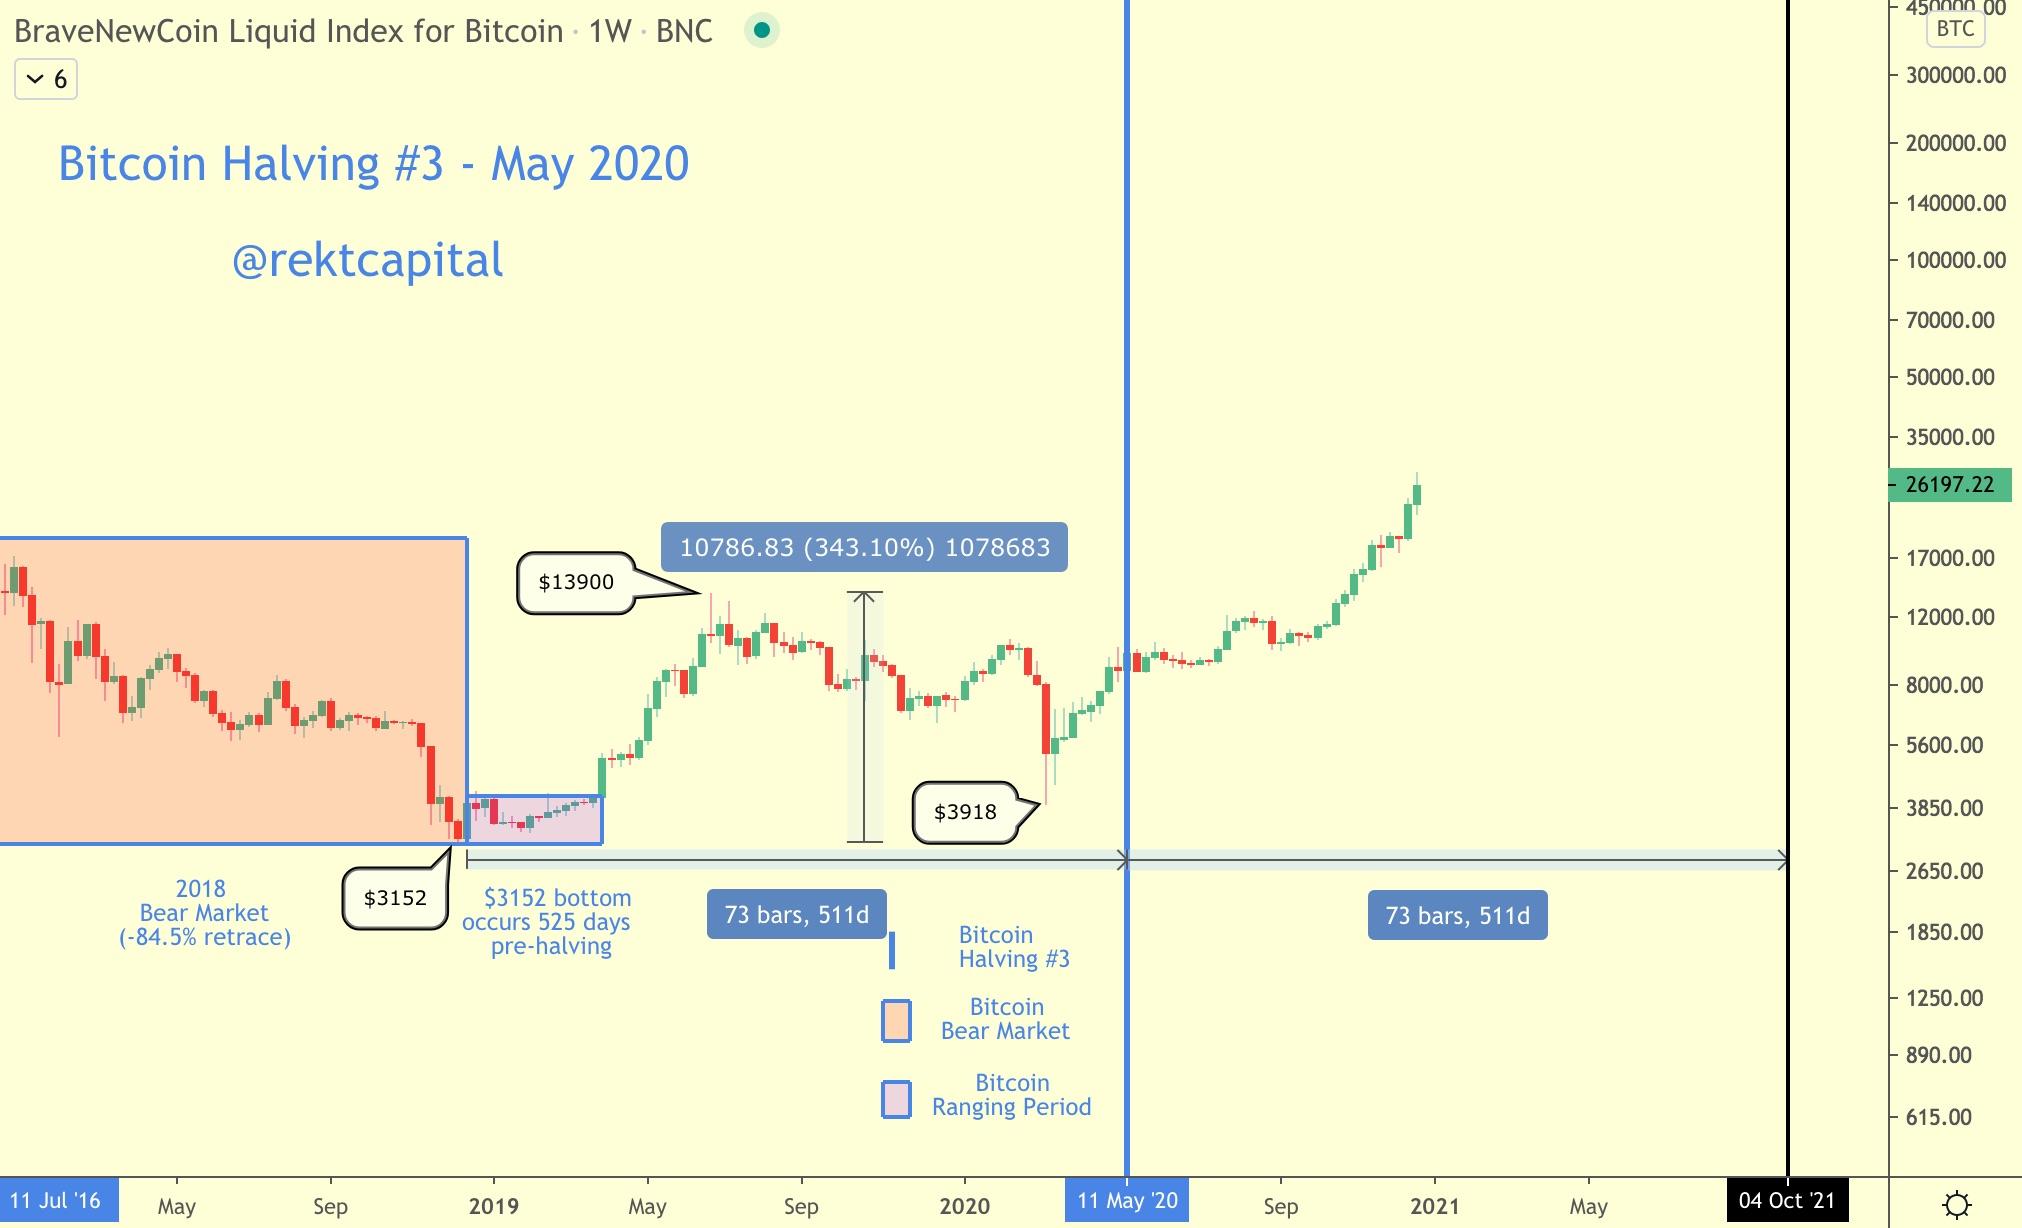 /predicting-bitcoins-2021-peak-vu1x342s feature image